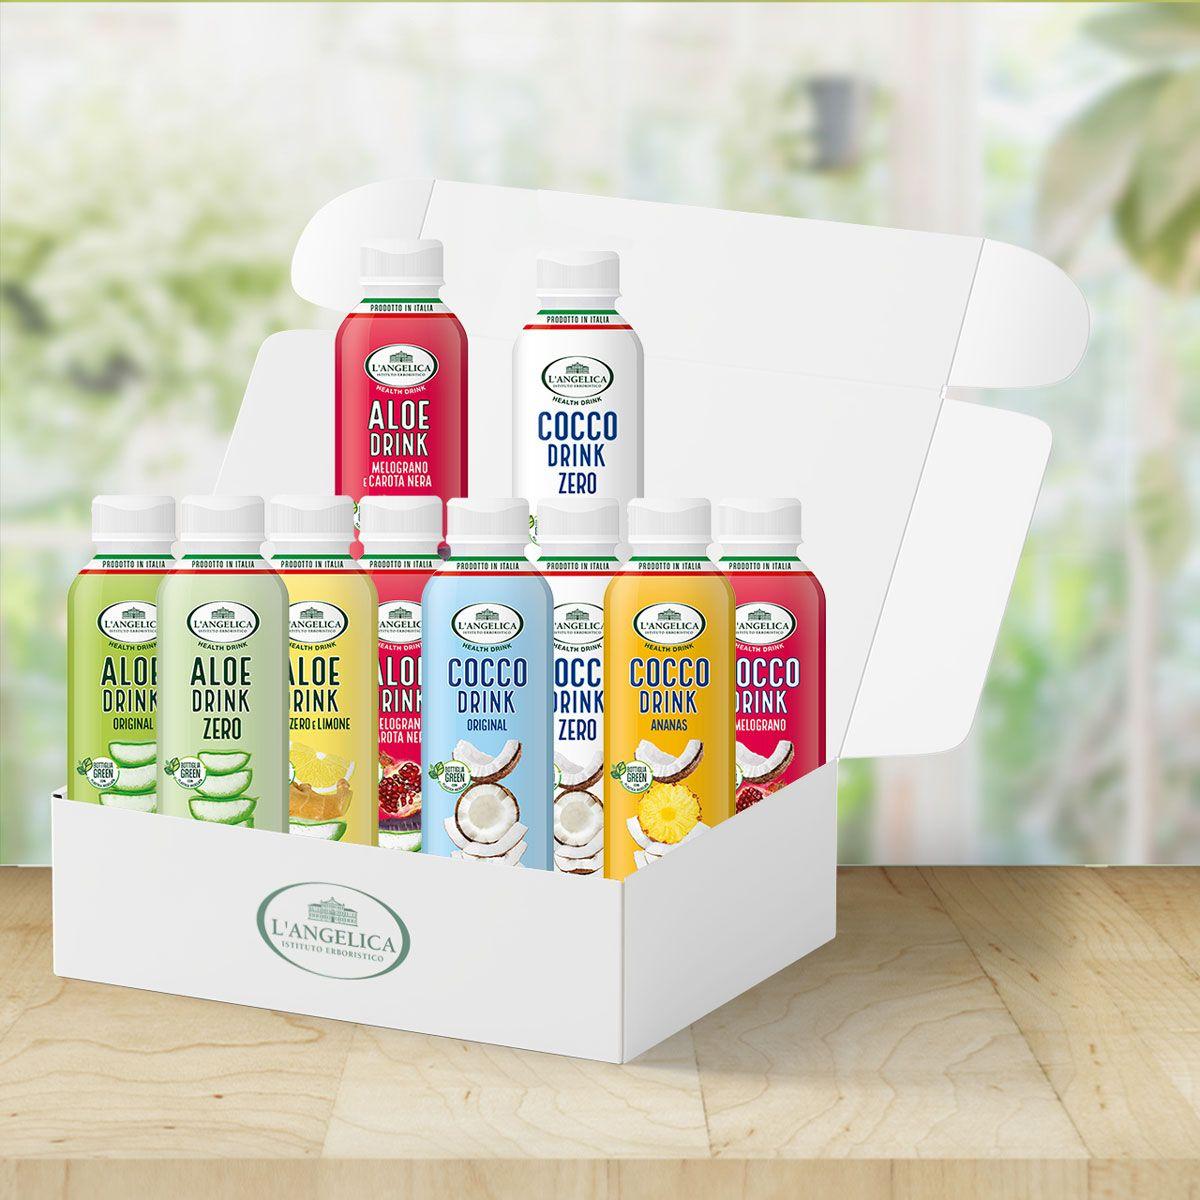 Box Health drinks